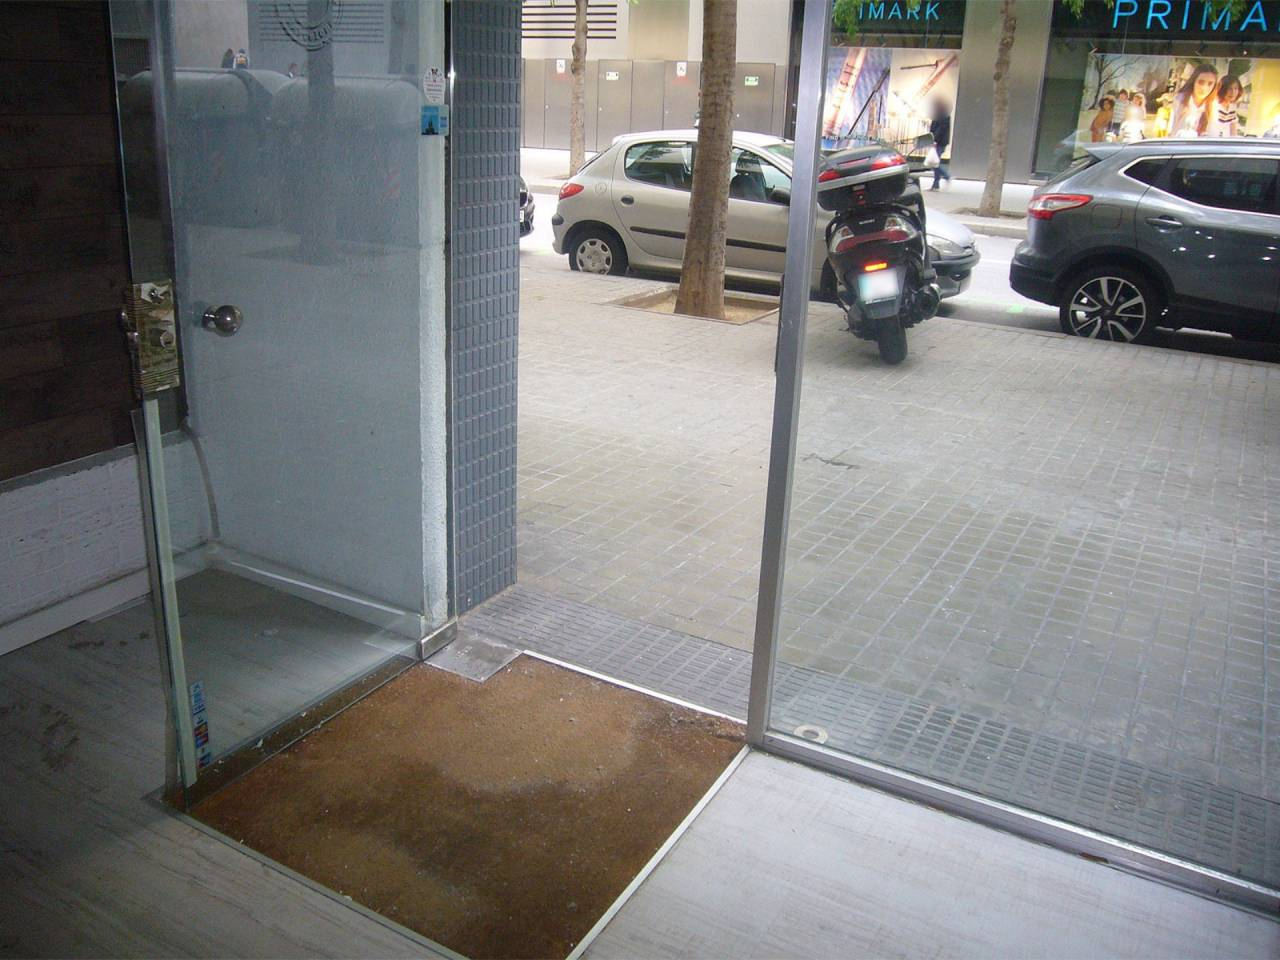 Local comercial en alquiler Les Corts (Barcelona Capital)